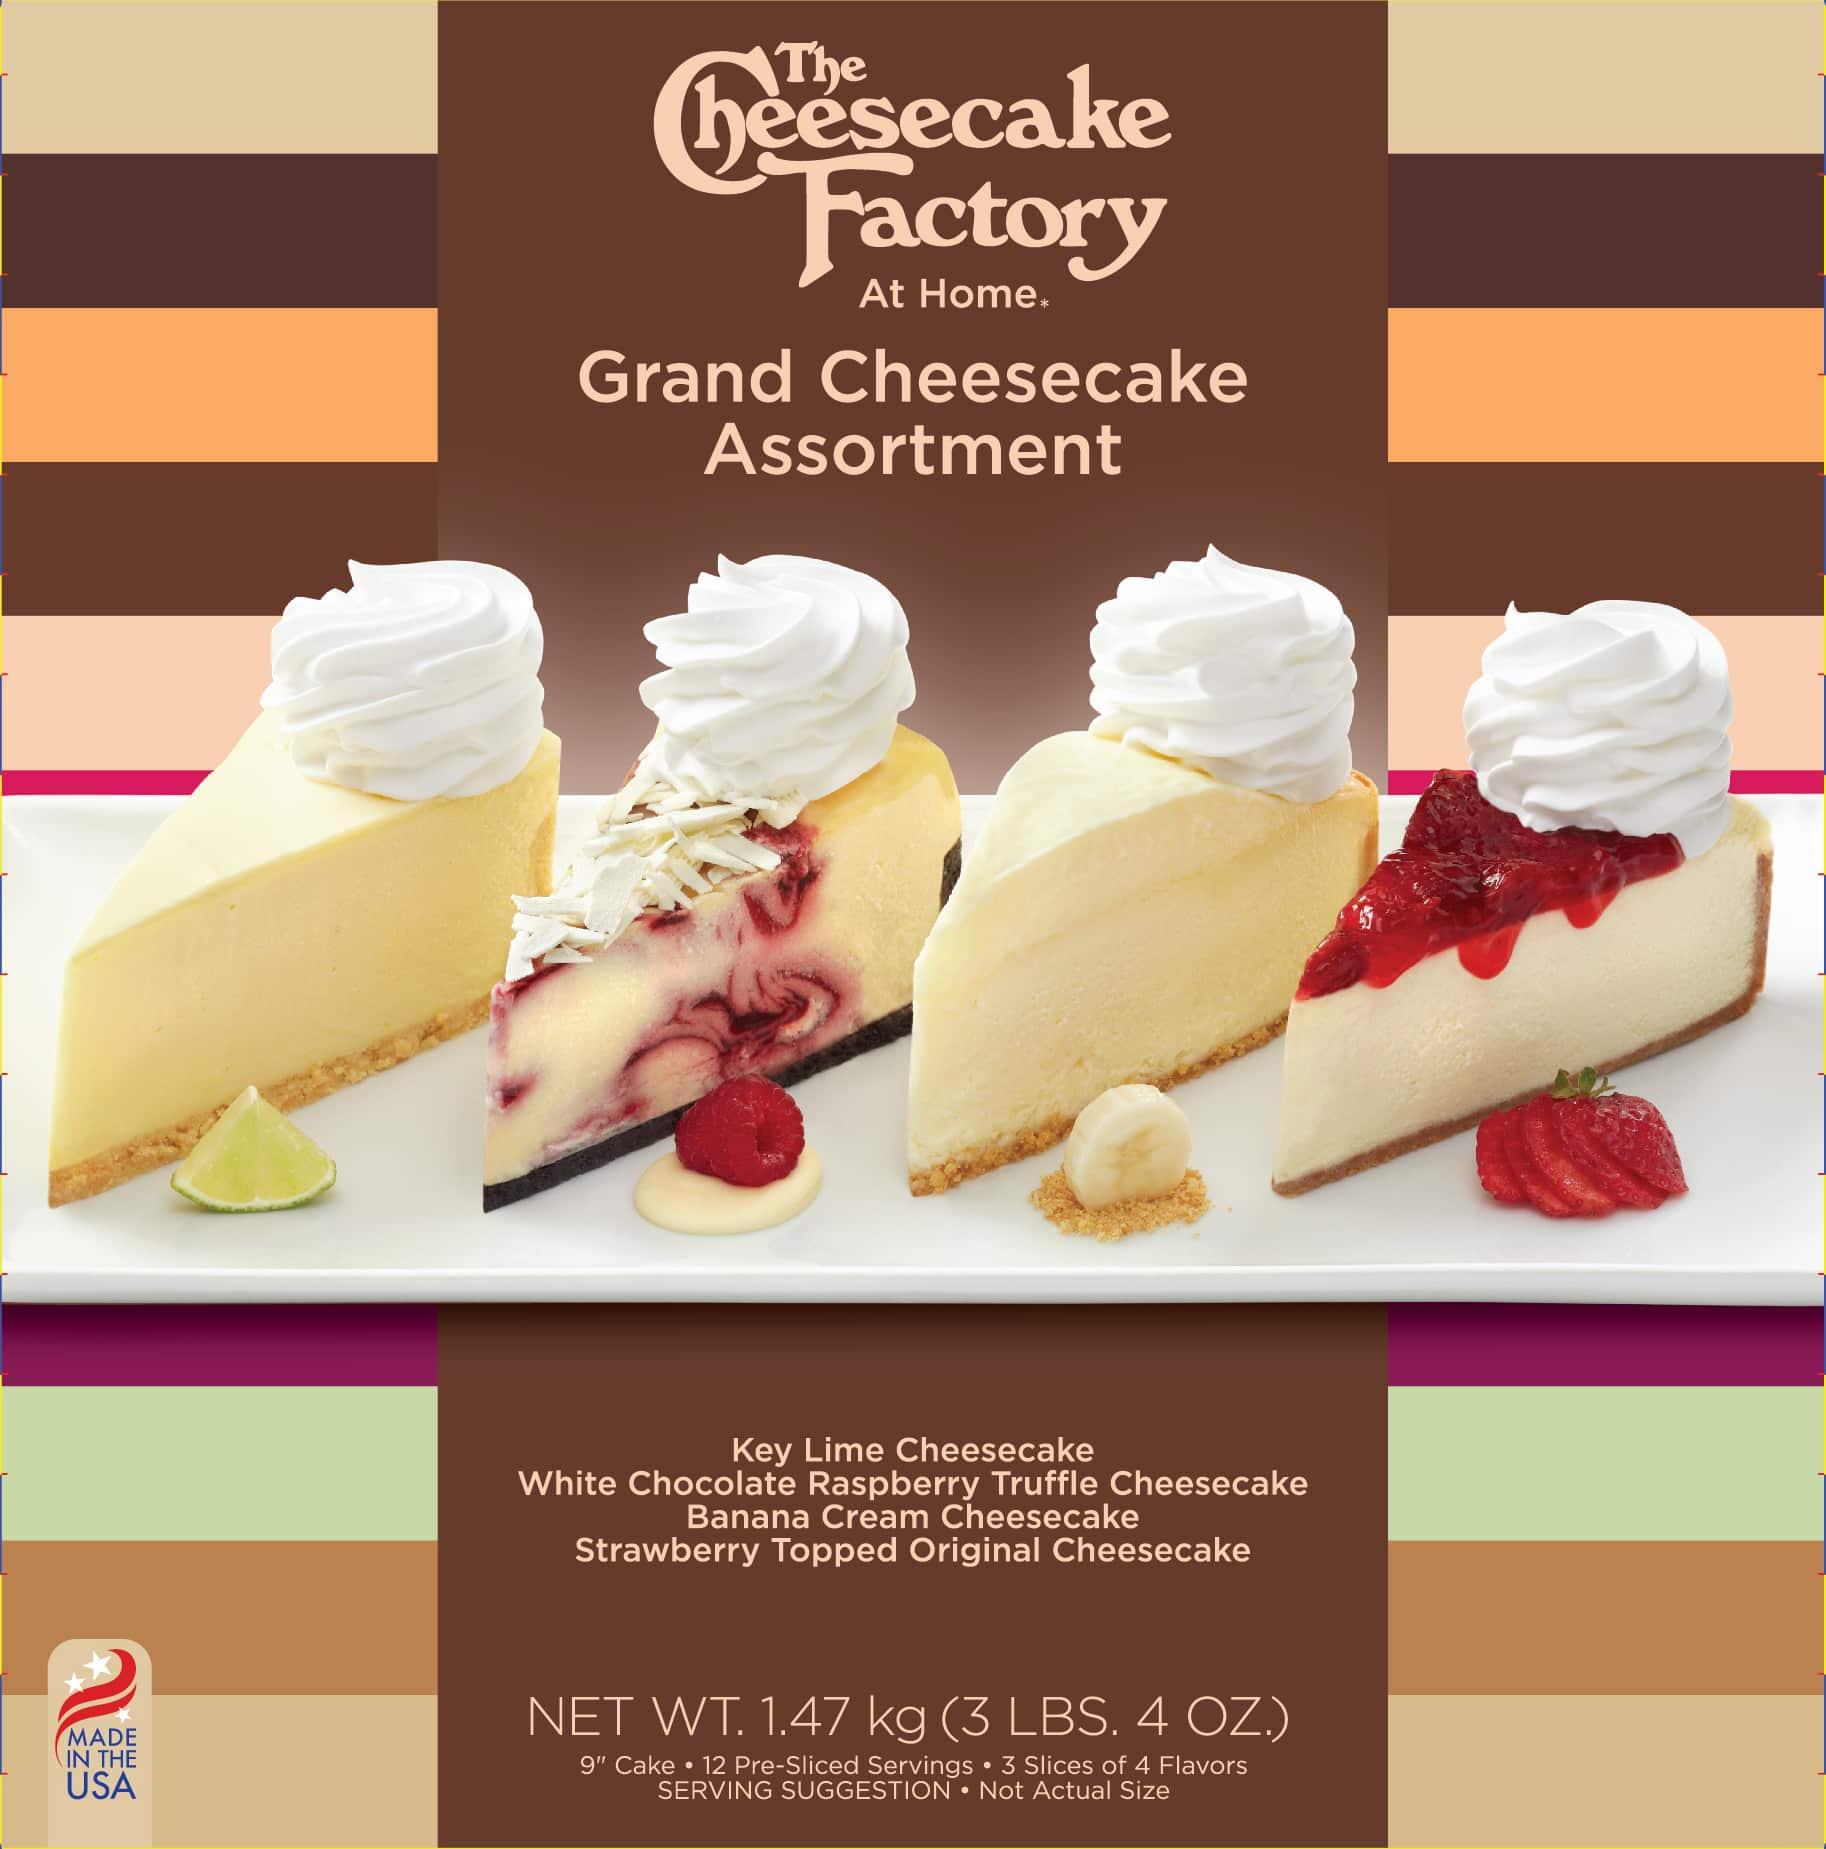 9 inch Grand Cheesecake factory assortment of Key Lime Cheesecake, White Chocolate Raspberry Truffle Cheesecake, Banana Cream Cheesecake & Strawberry Topped Original Cheesecake